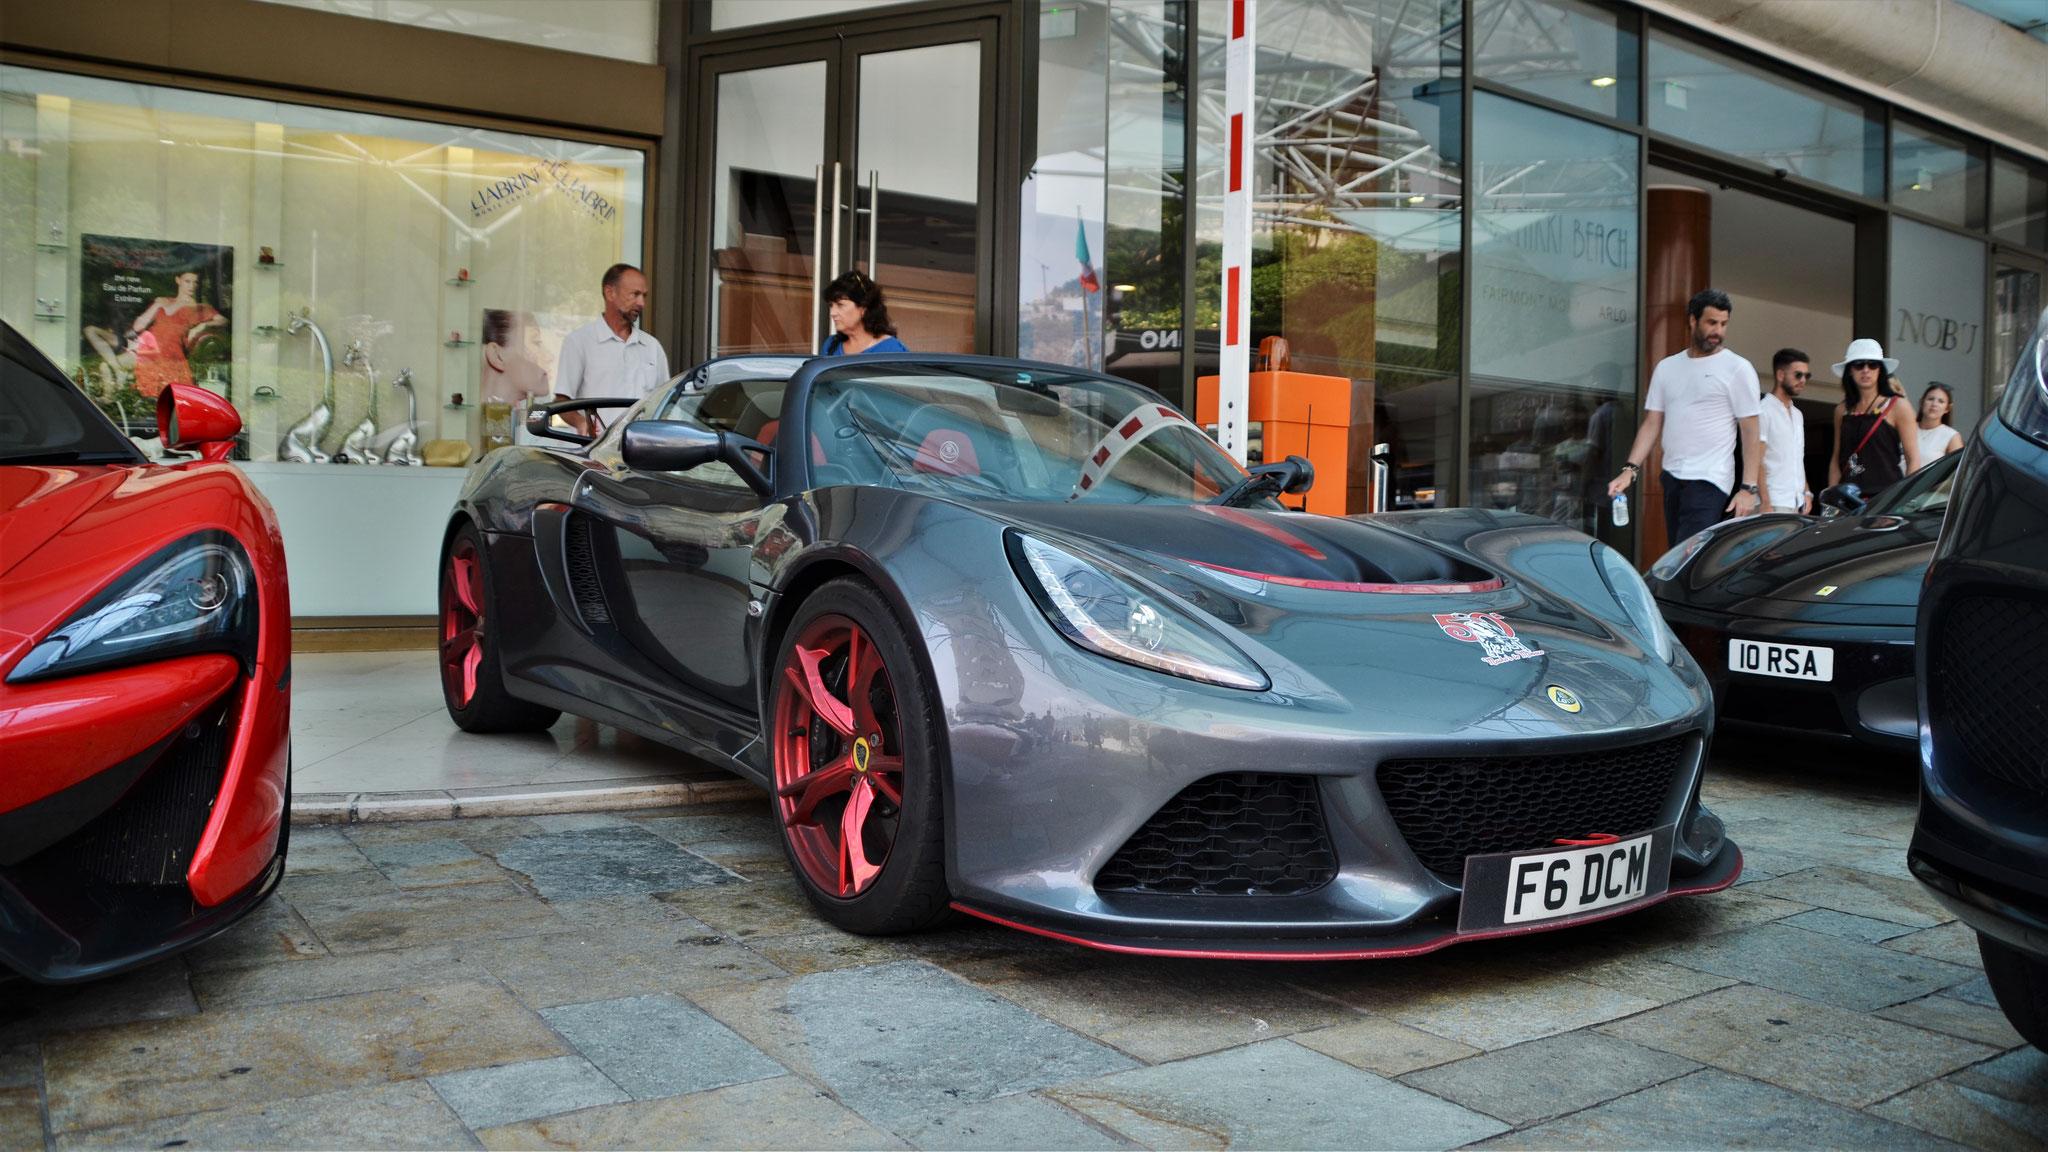 Lotus Exige 360 Cup - F6-DCM (GB)